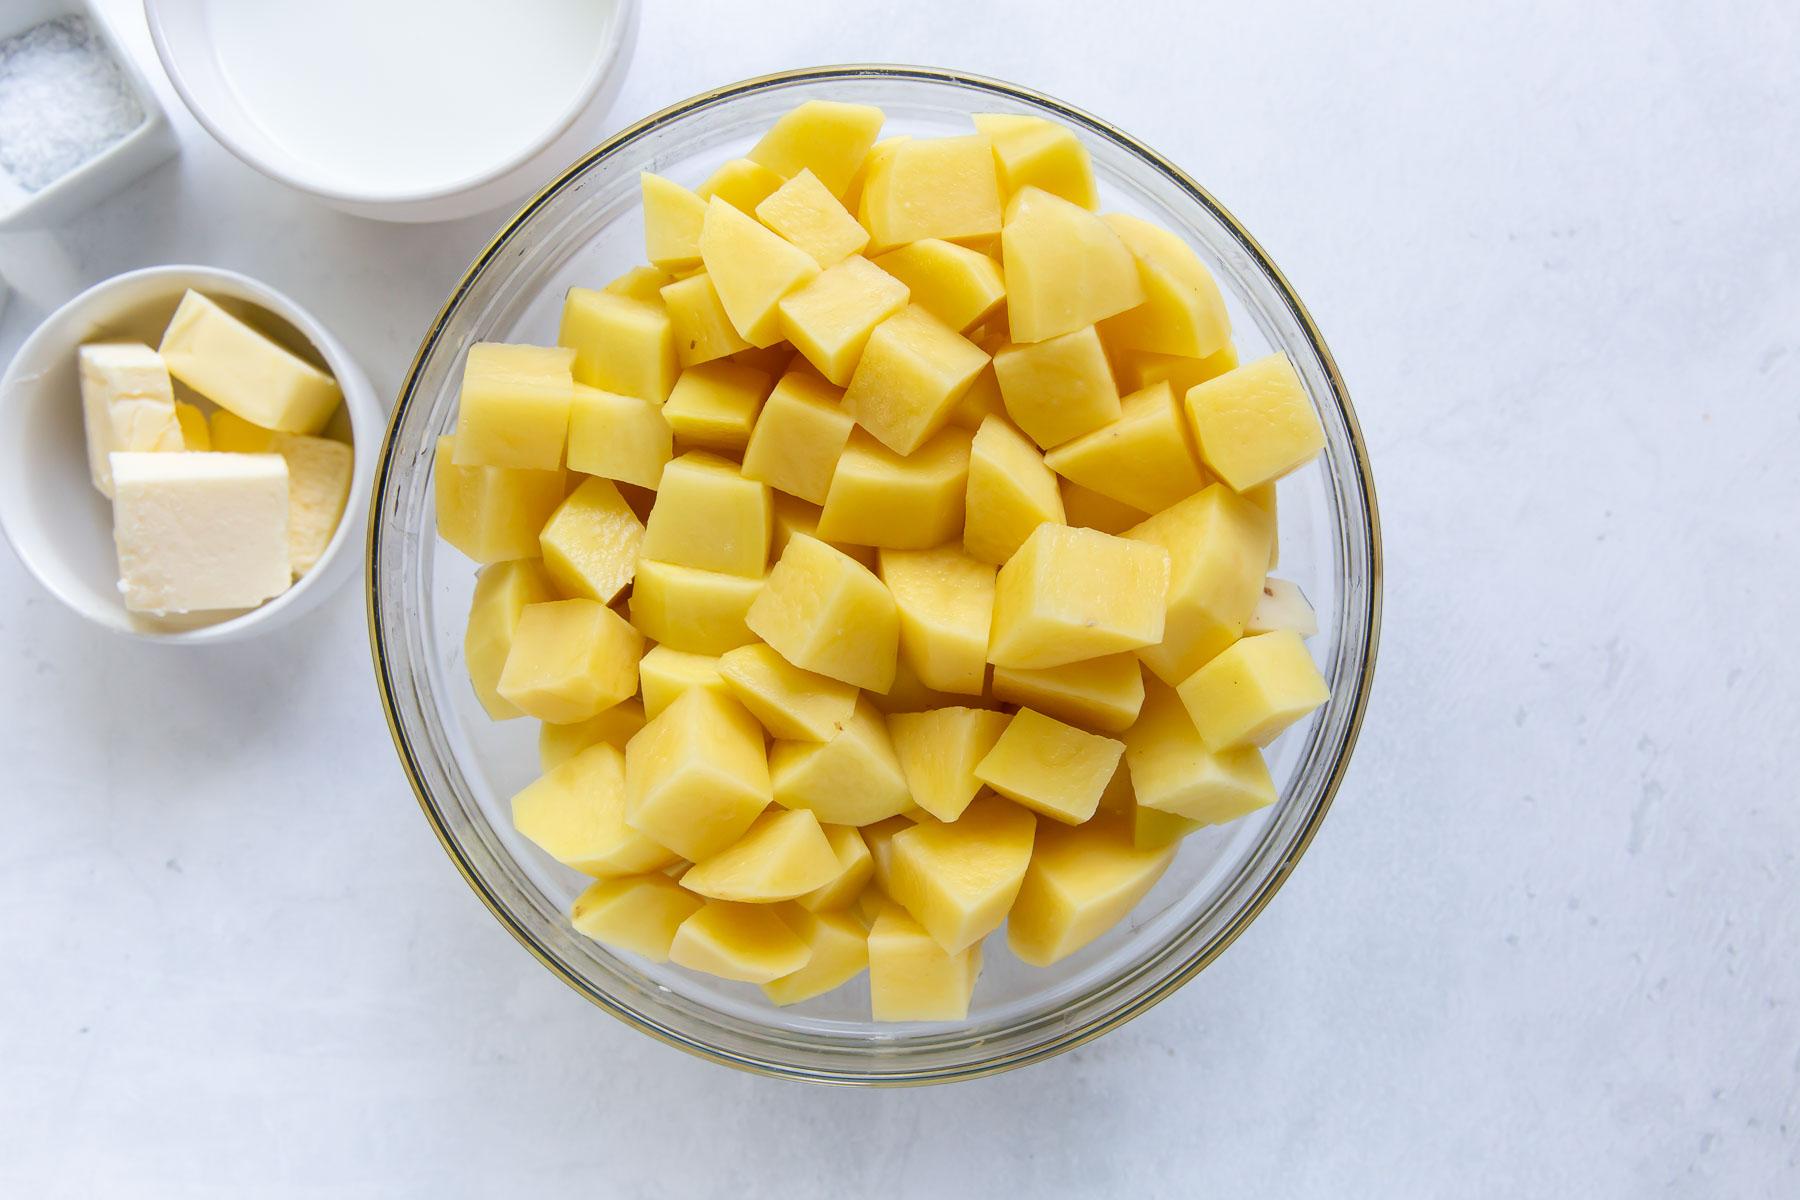 recipe ingredients: chopped yukon gold potatoes, butter, milk and salt in bowls